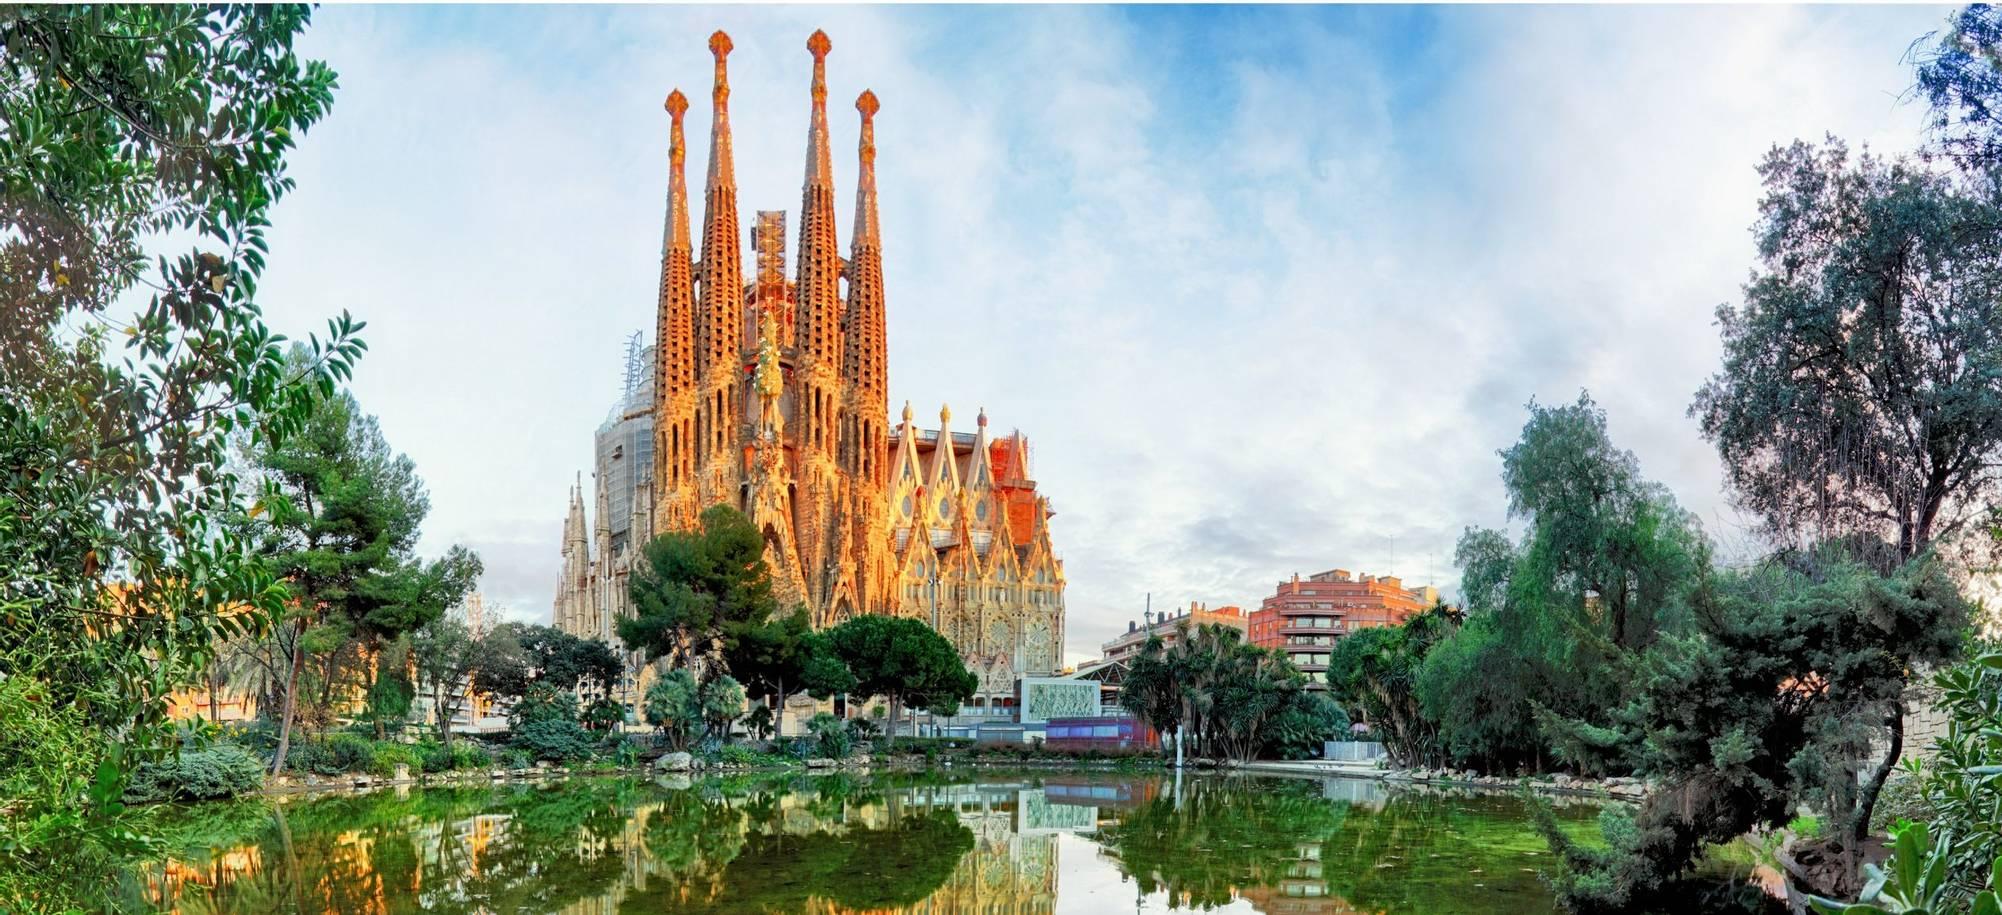 Itinerary Desktop - Day 19 - Barcelona.jpg